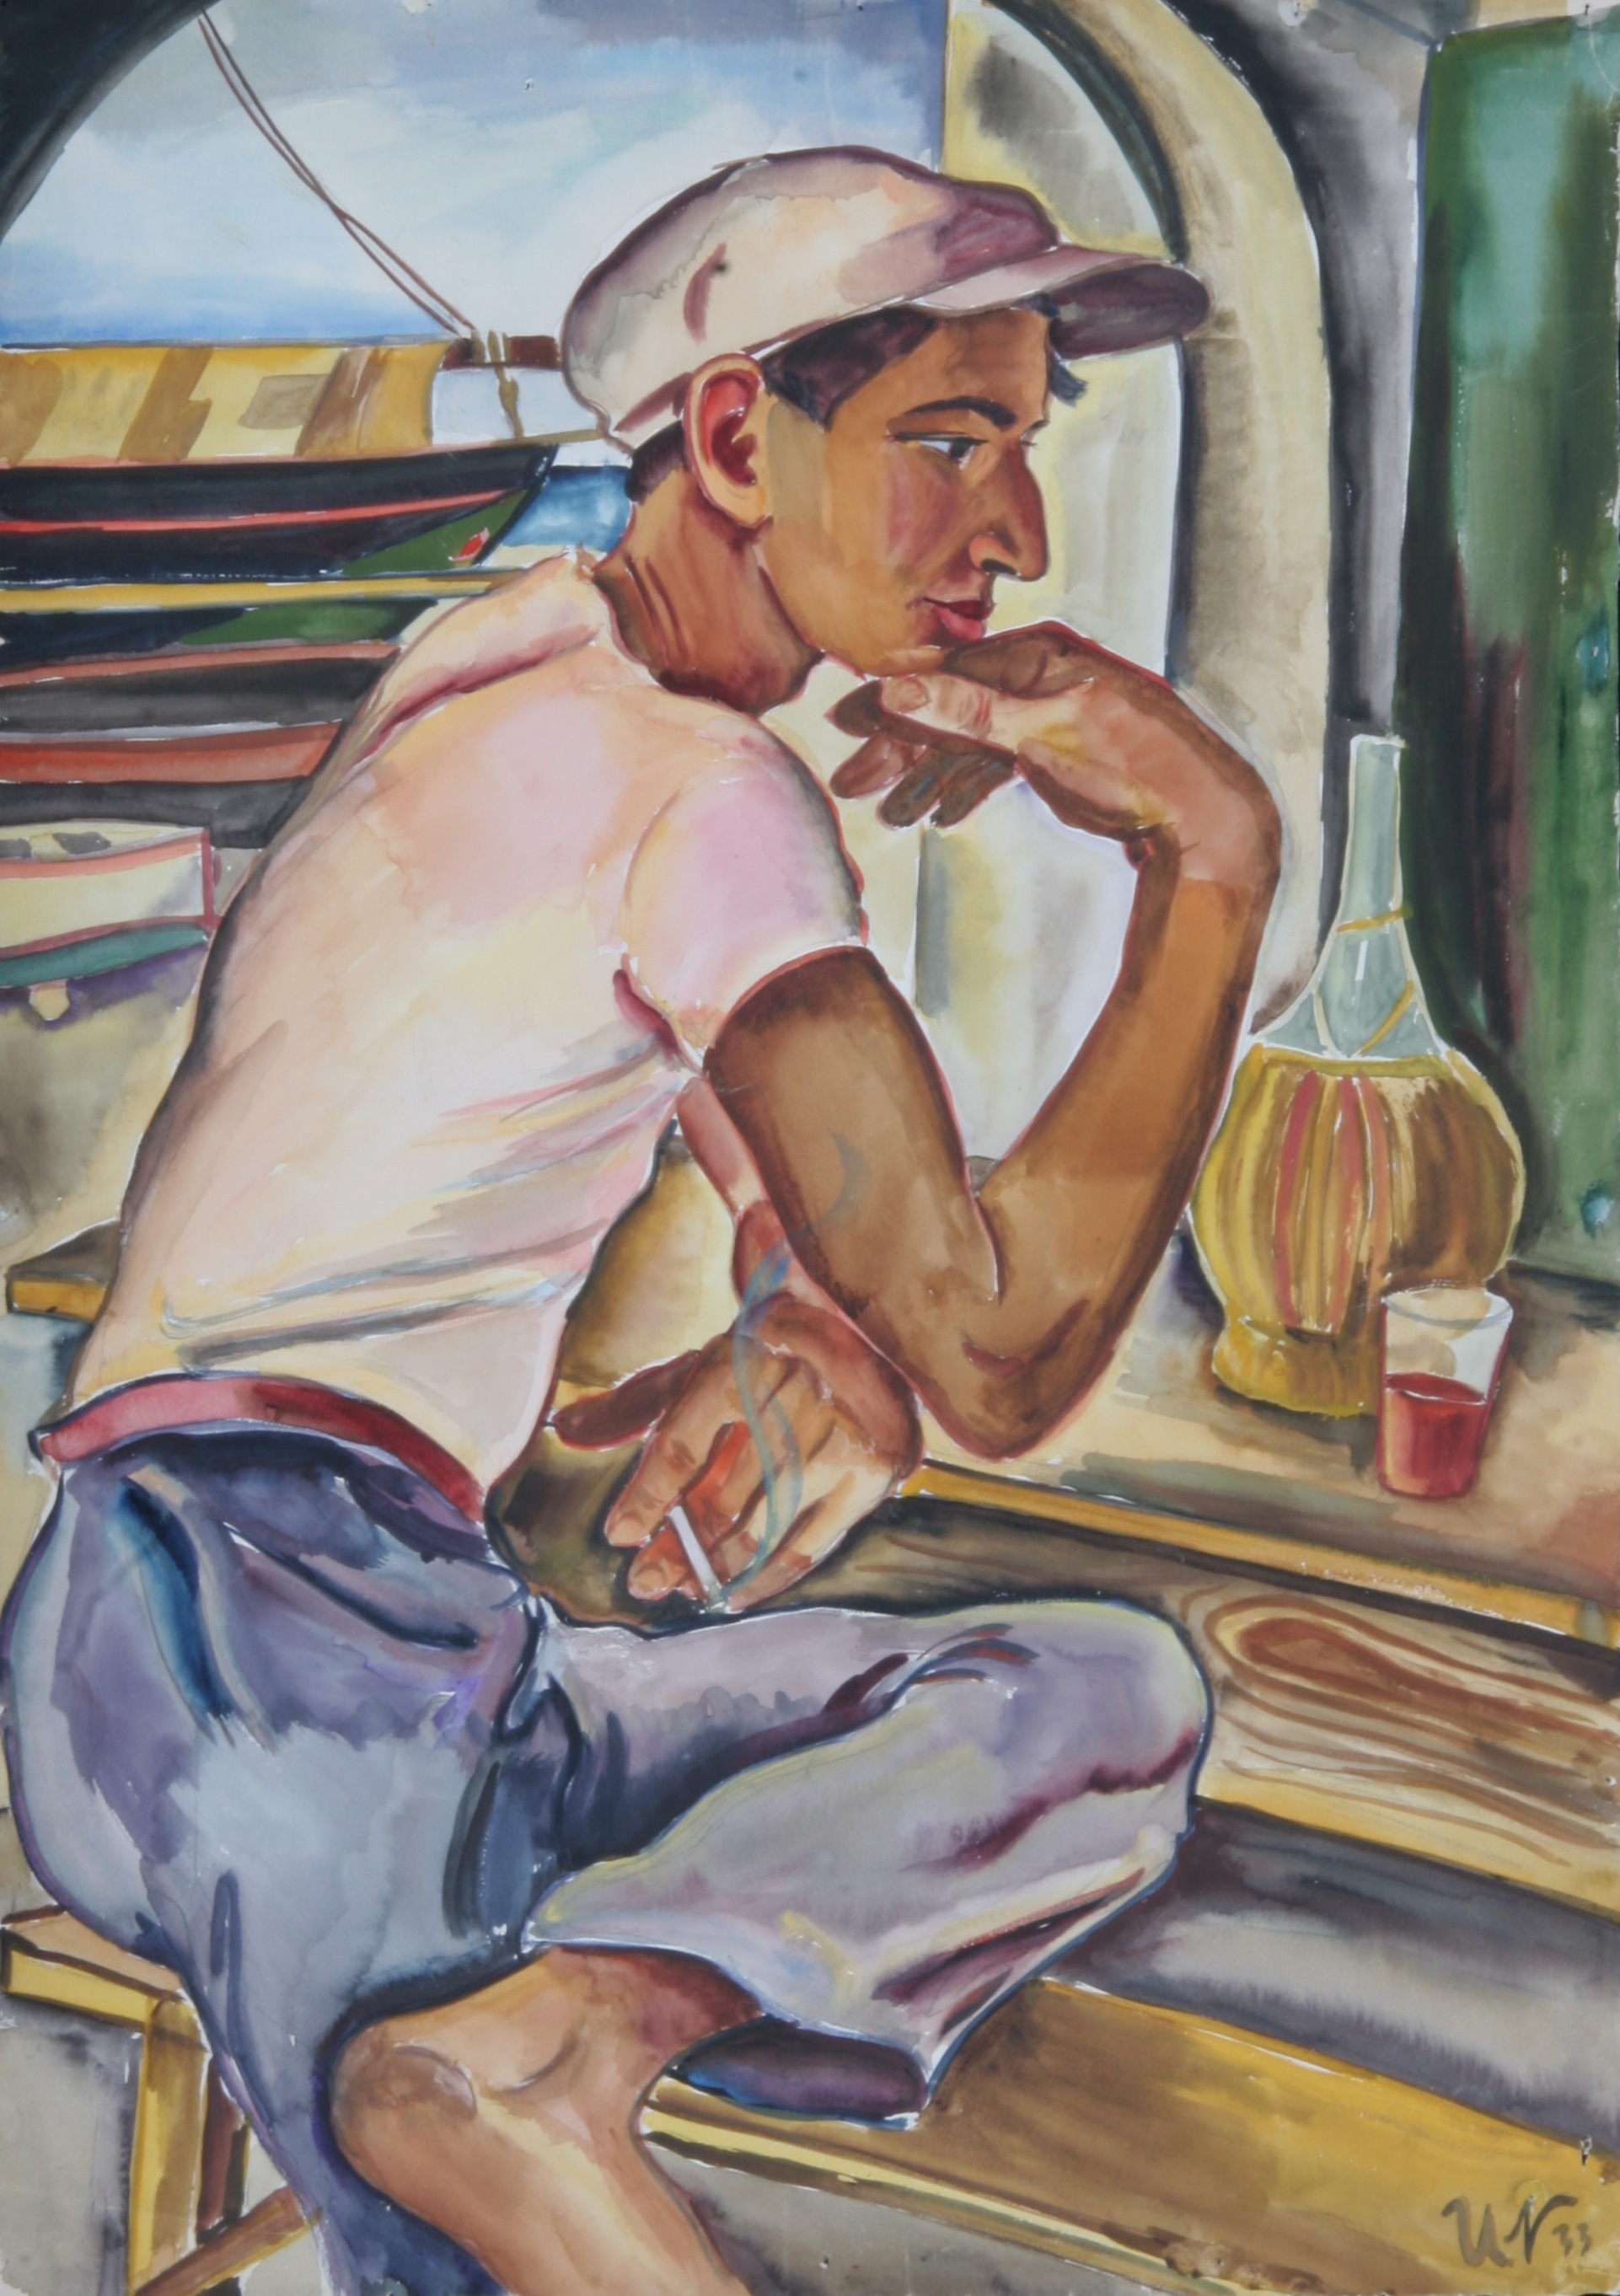 Junger Fischer im Pescatore, Sant' Angelo 1933, Aquarell, 53 x 74 cm